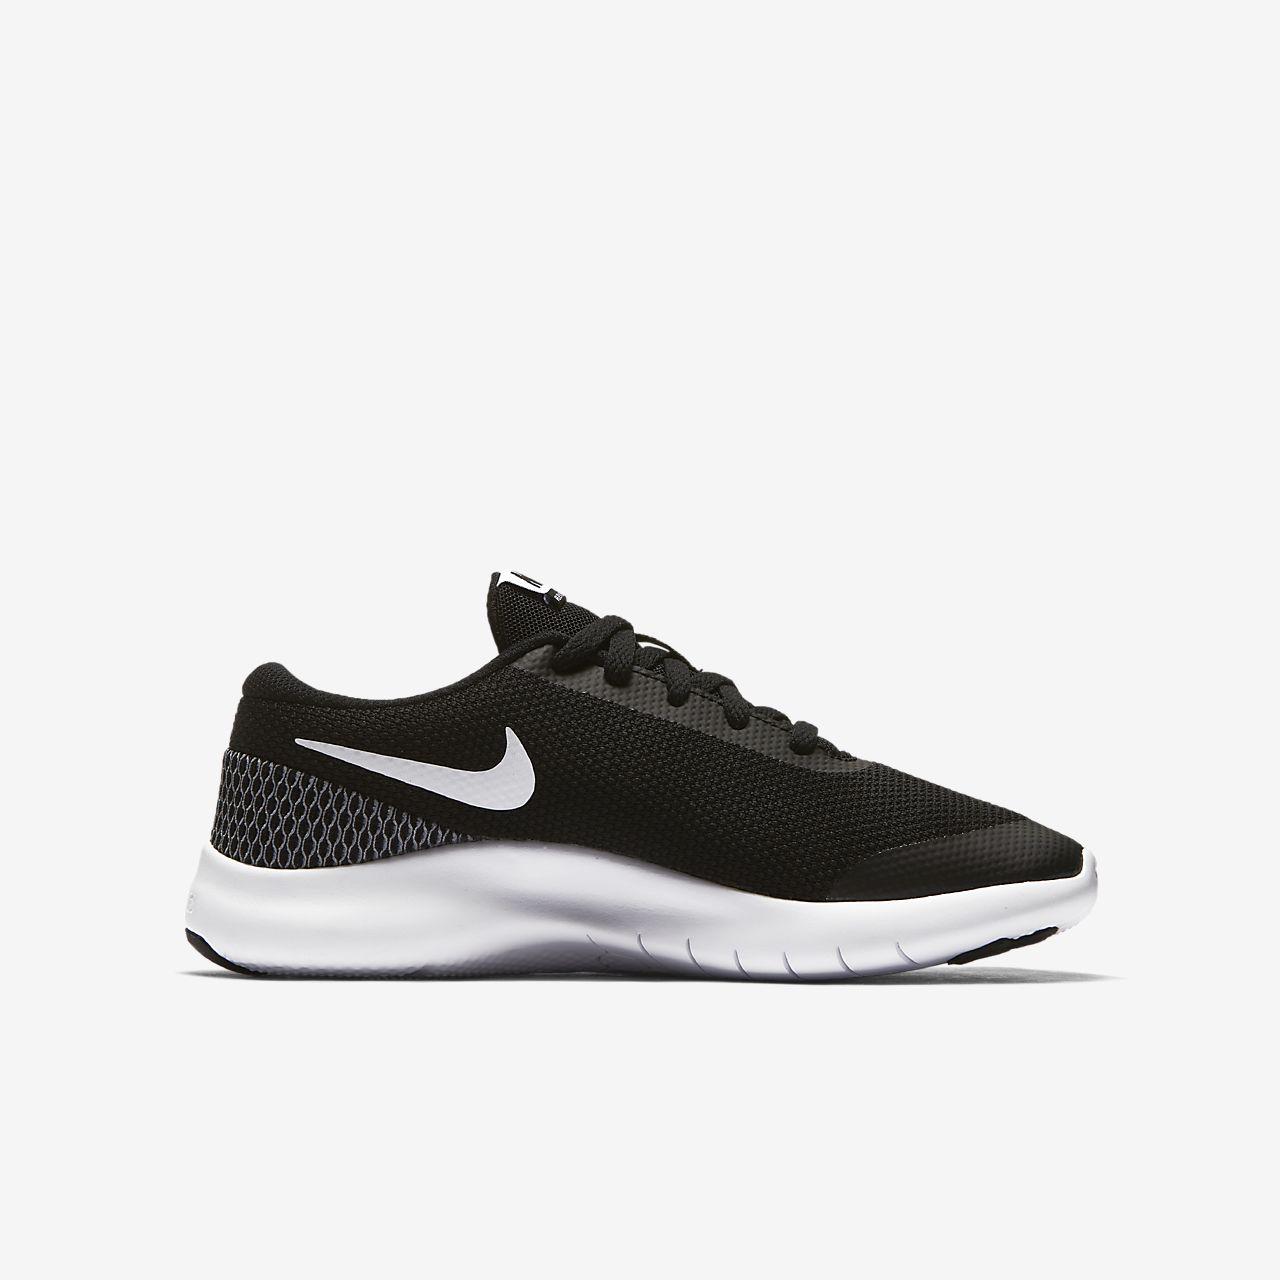 de9bd2f8 Nike Flex Experience Run 7 Older Kids' Running Shoe. Nike.com CA